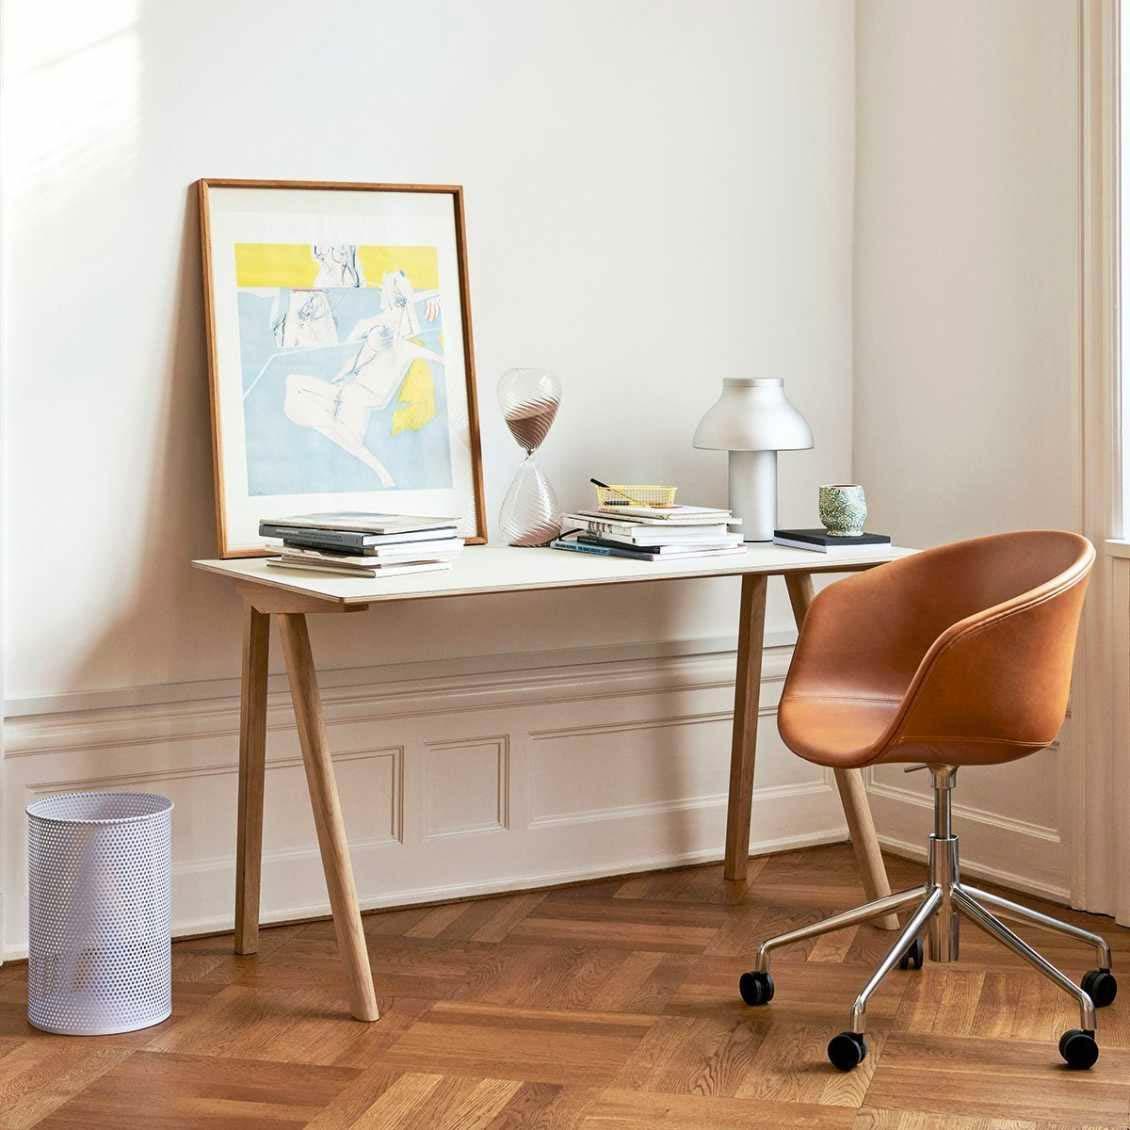 mooie design bureaustoelmooie design bureaustoel